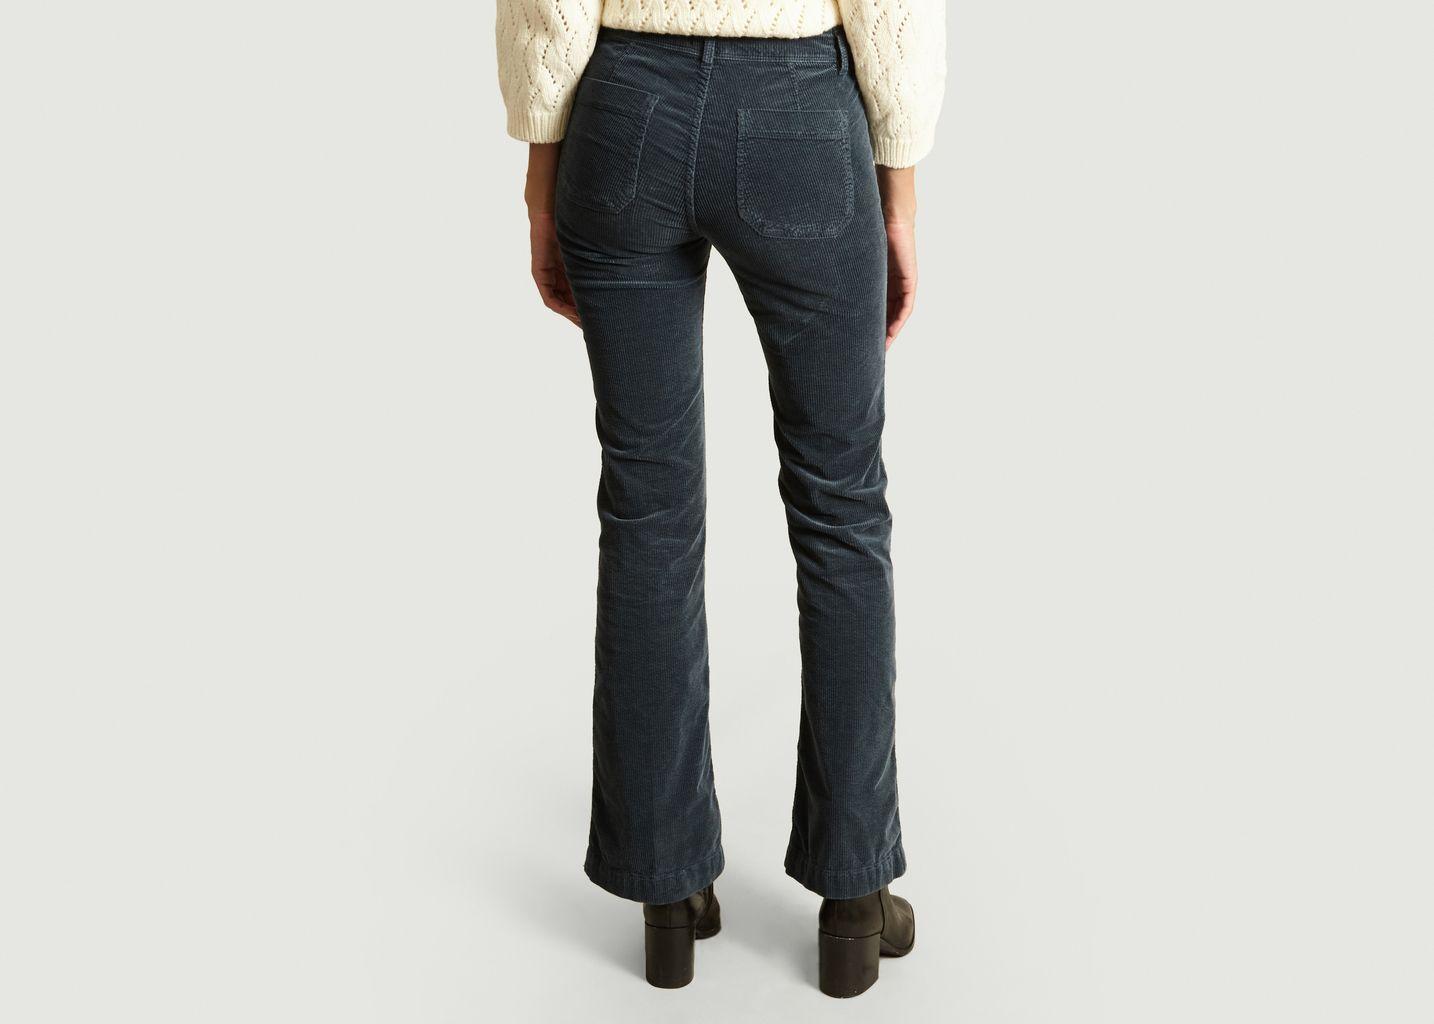 Pantalon Velours Côtelé - Swildens